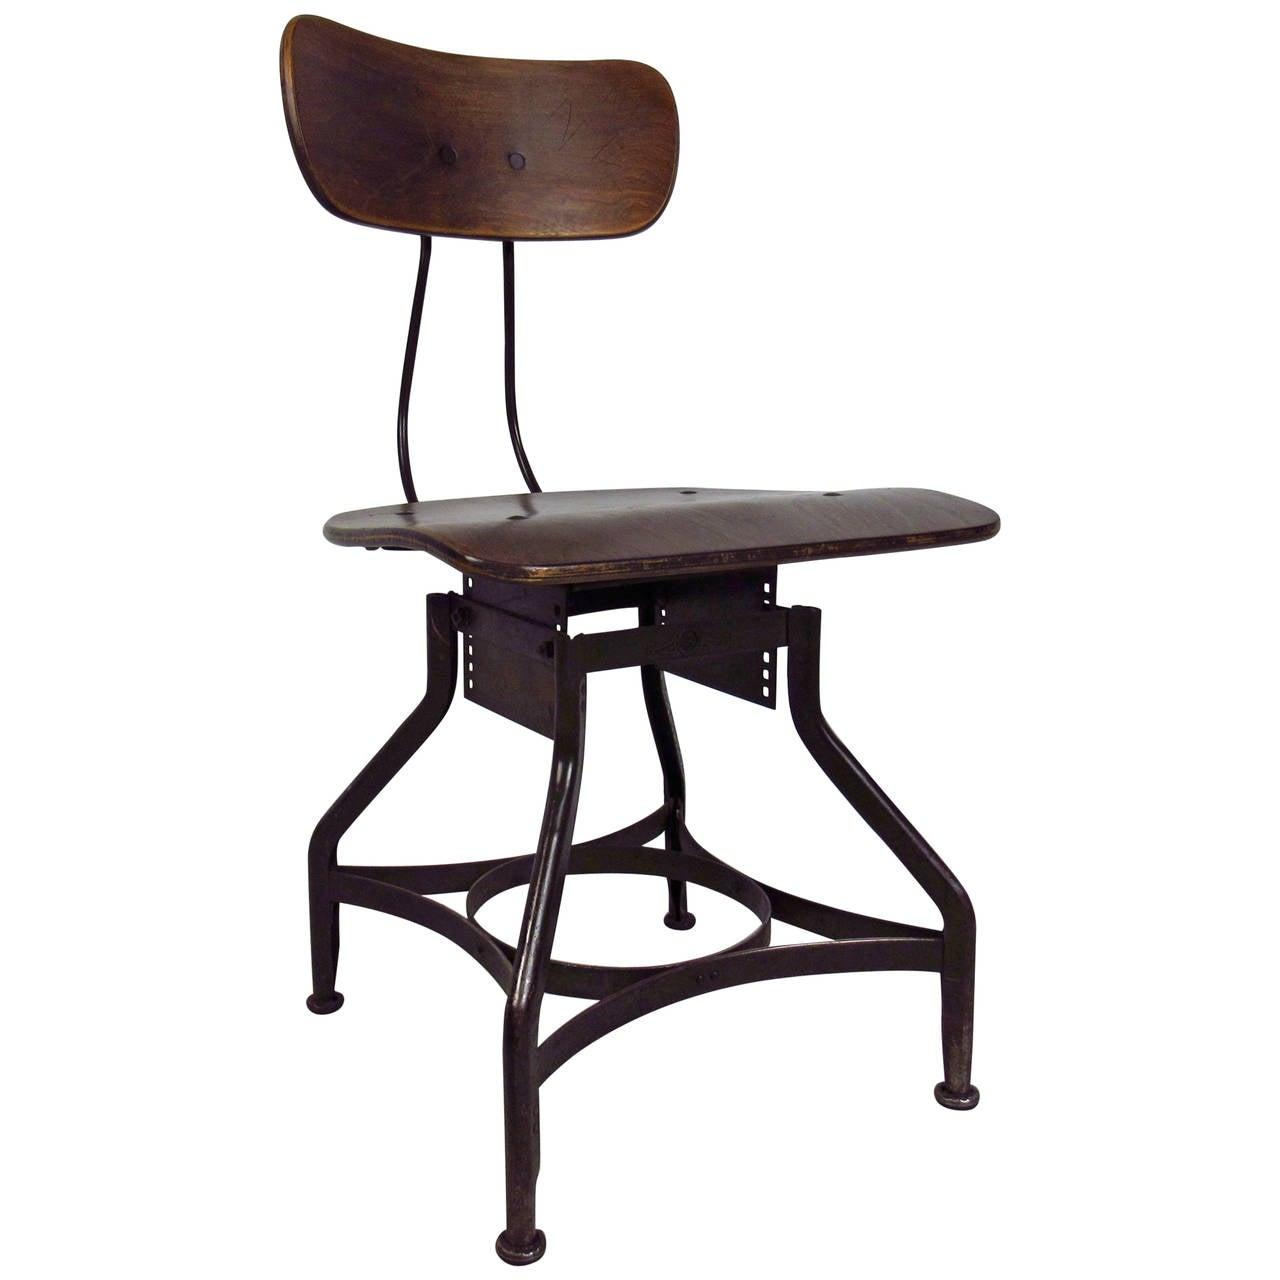 Industrial Desk Chair by UHL Steel for Toledo Metal